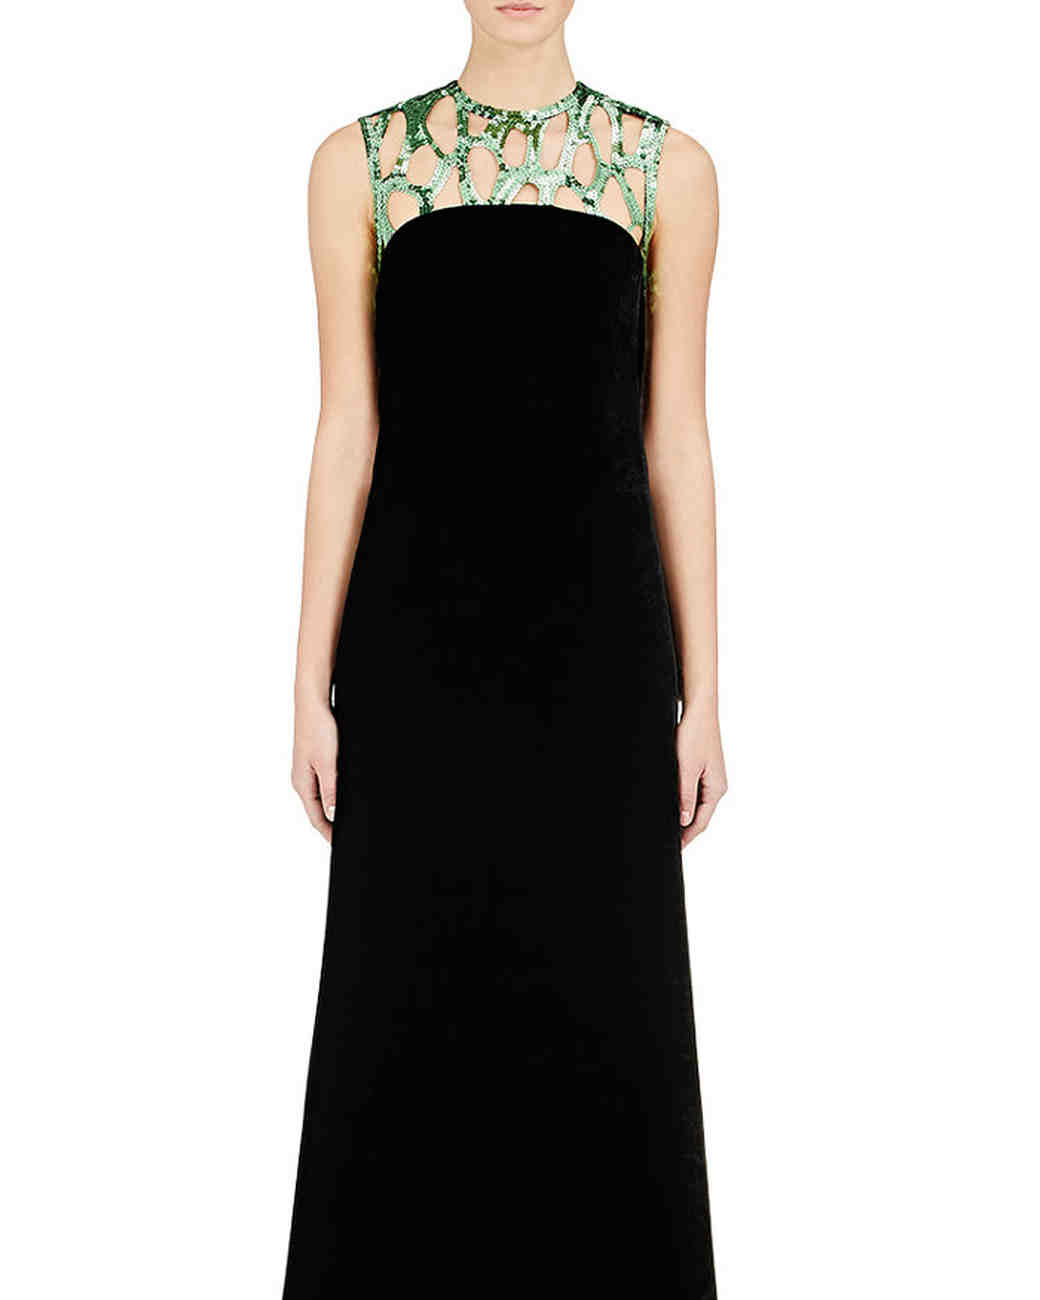 Black Velvet Gown with Gold Neckline